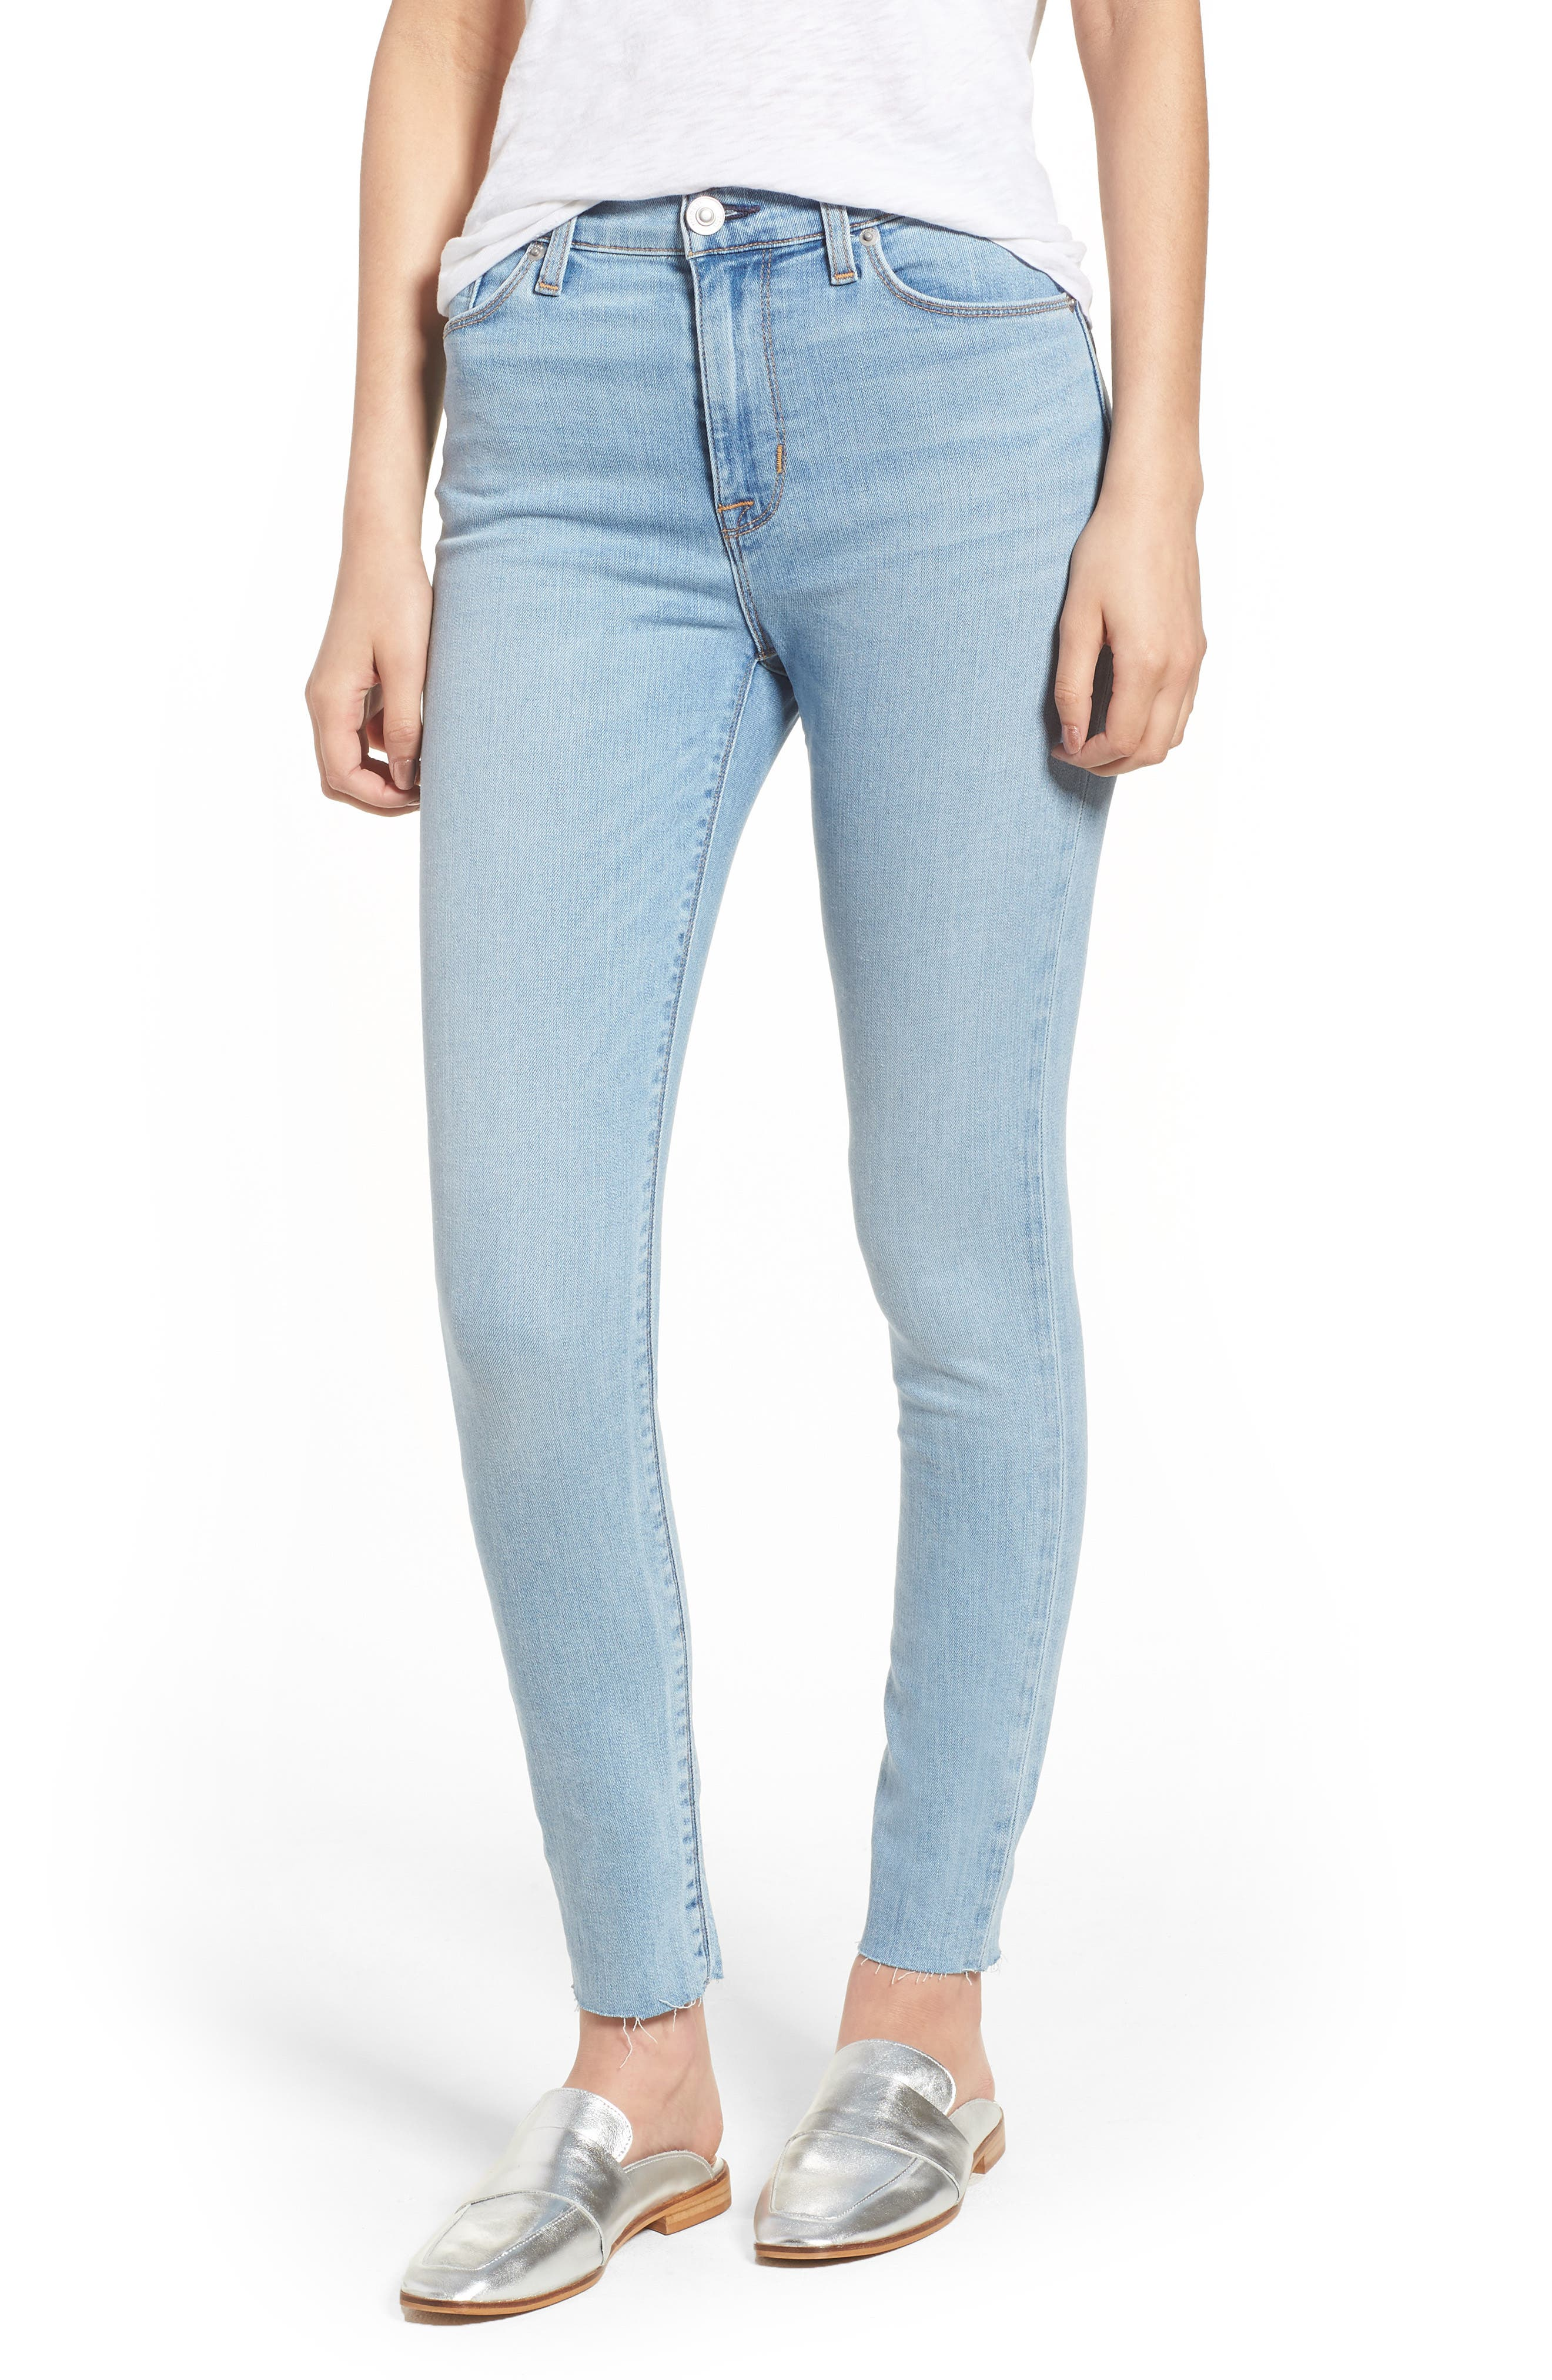 Hudson Barbara High Waist Ankle Skinny Jeans,                             Main thumbnail 1, color,                             Gemini